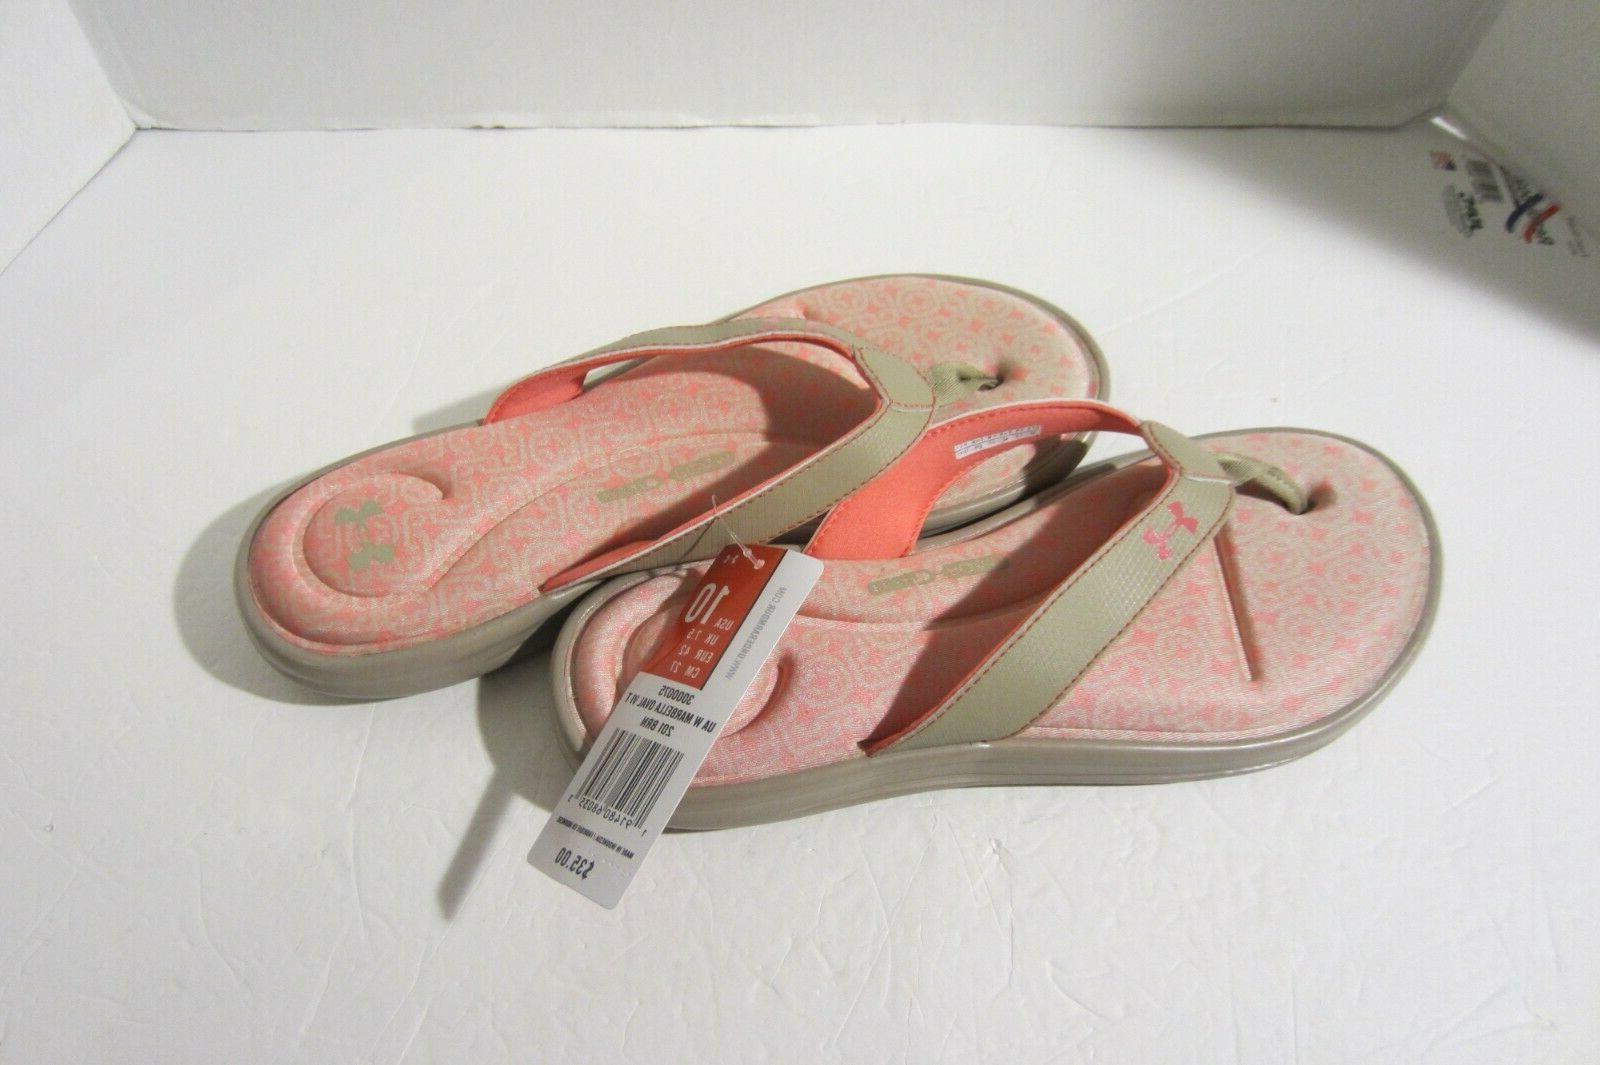 Under Armour Marbella Oval VI, Flip Flops, Sandals,